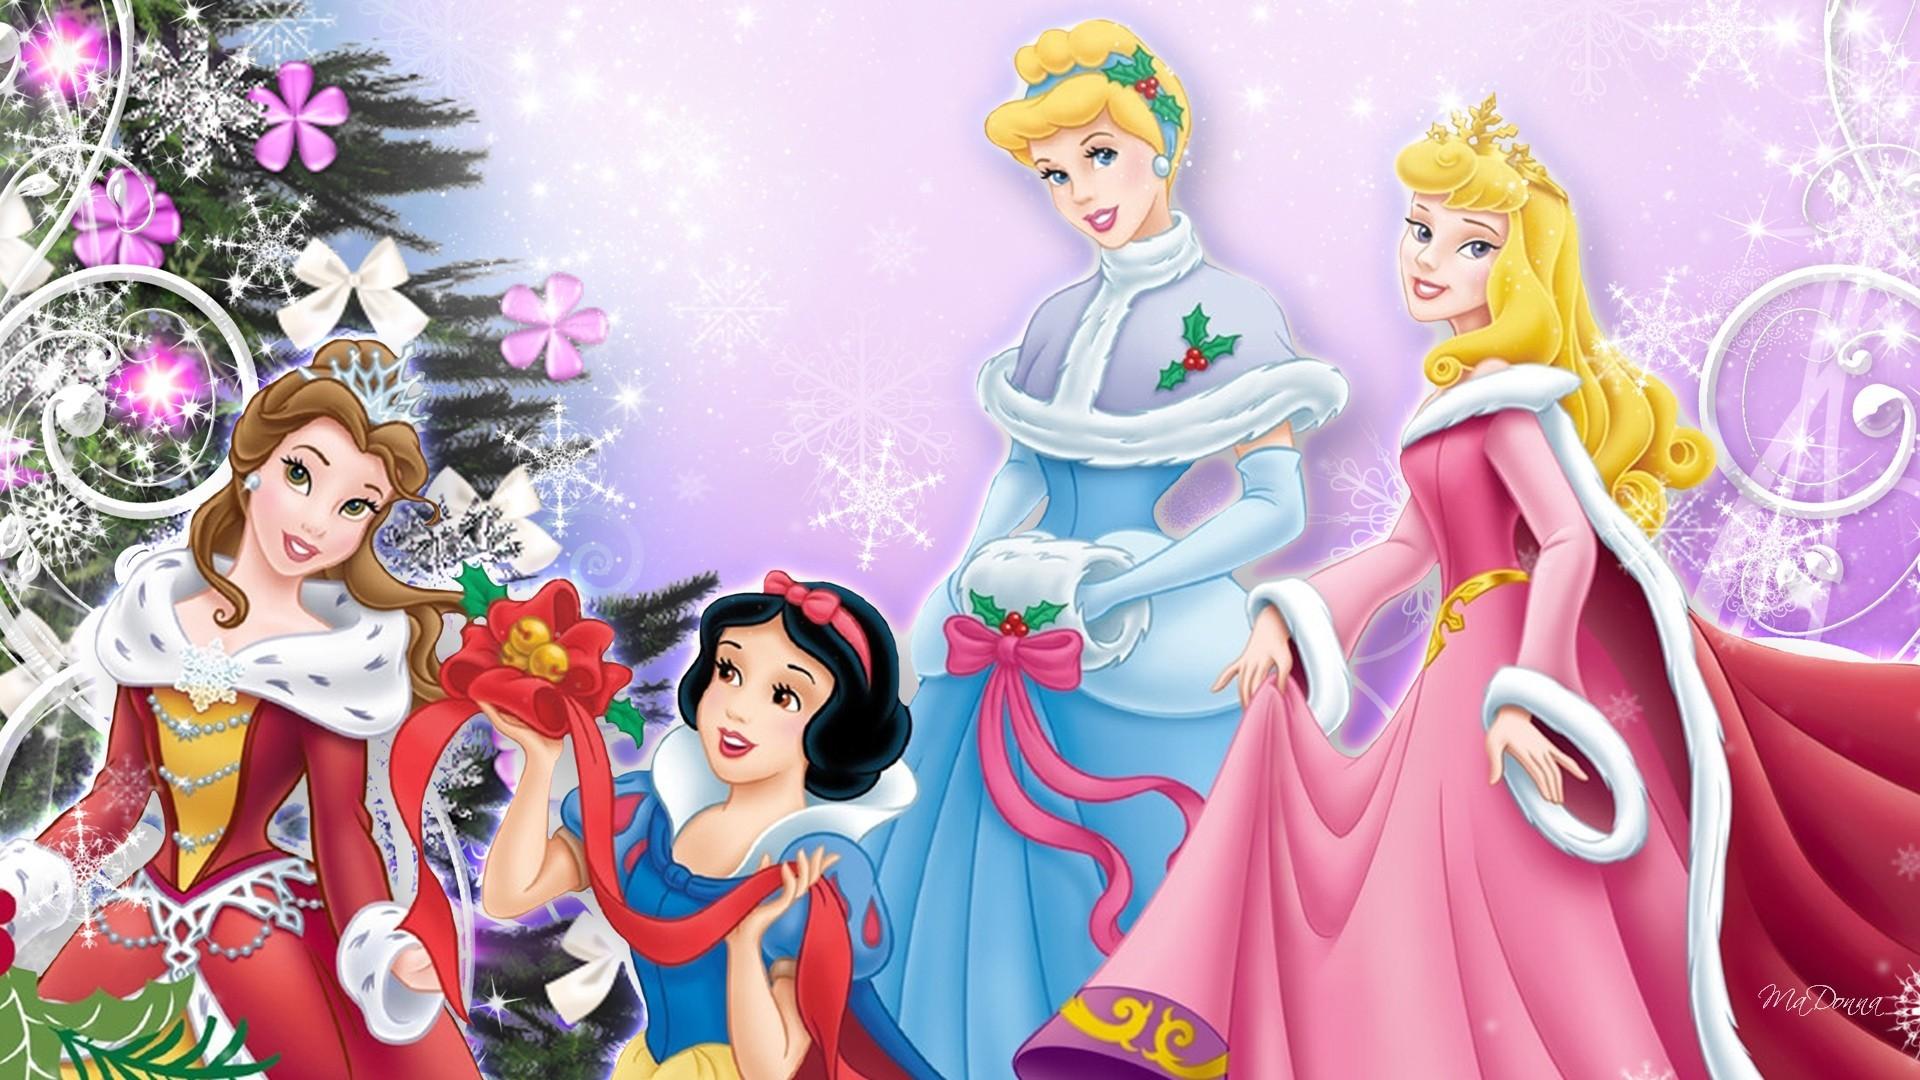 A Princess For Christmas Full Movie Free